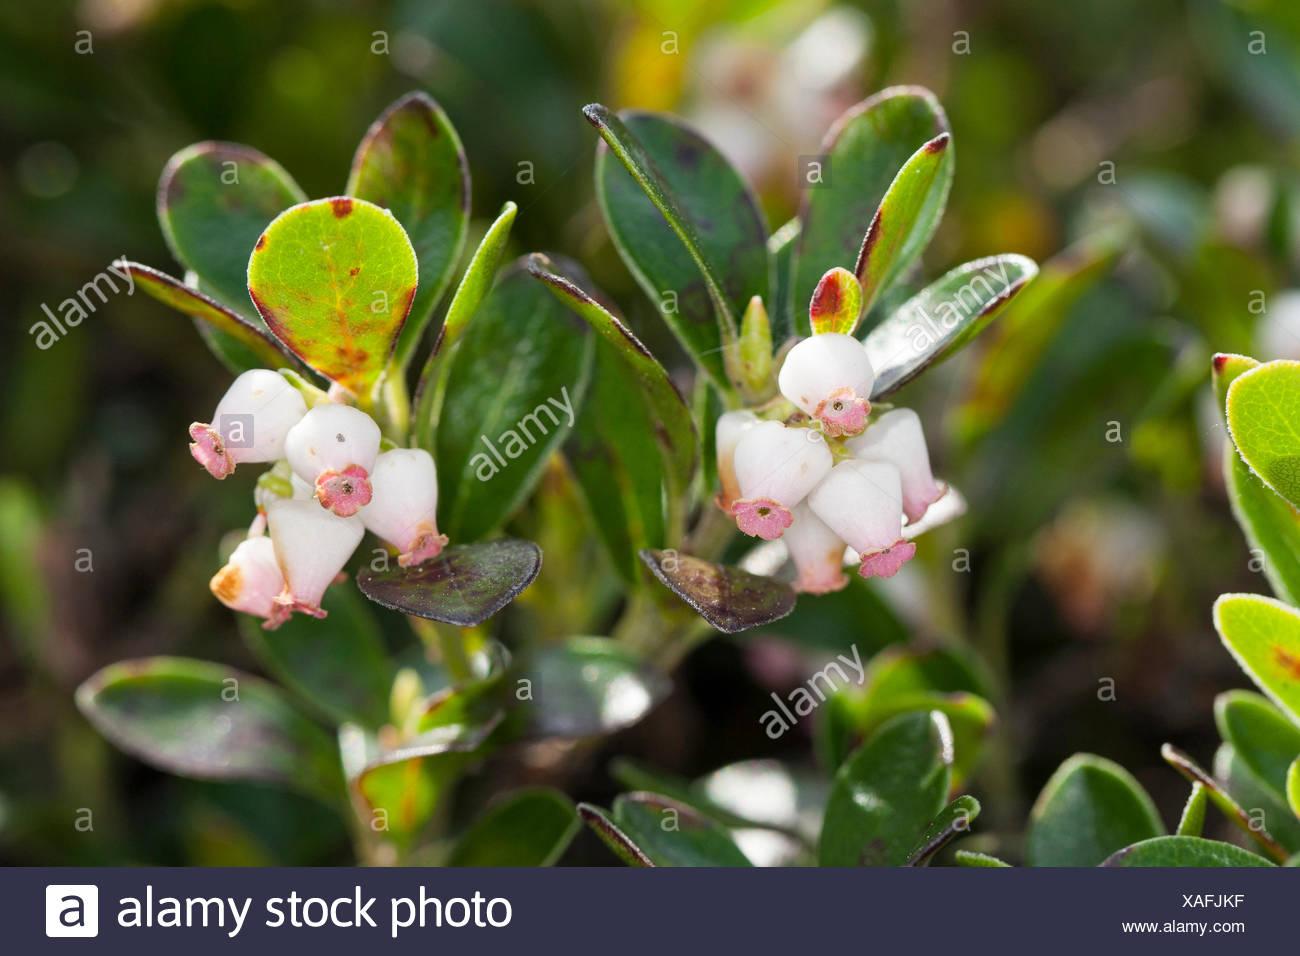 bearberry (Arctostaphylos uva-ursi), blooming, Germany - Stock Image